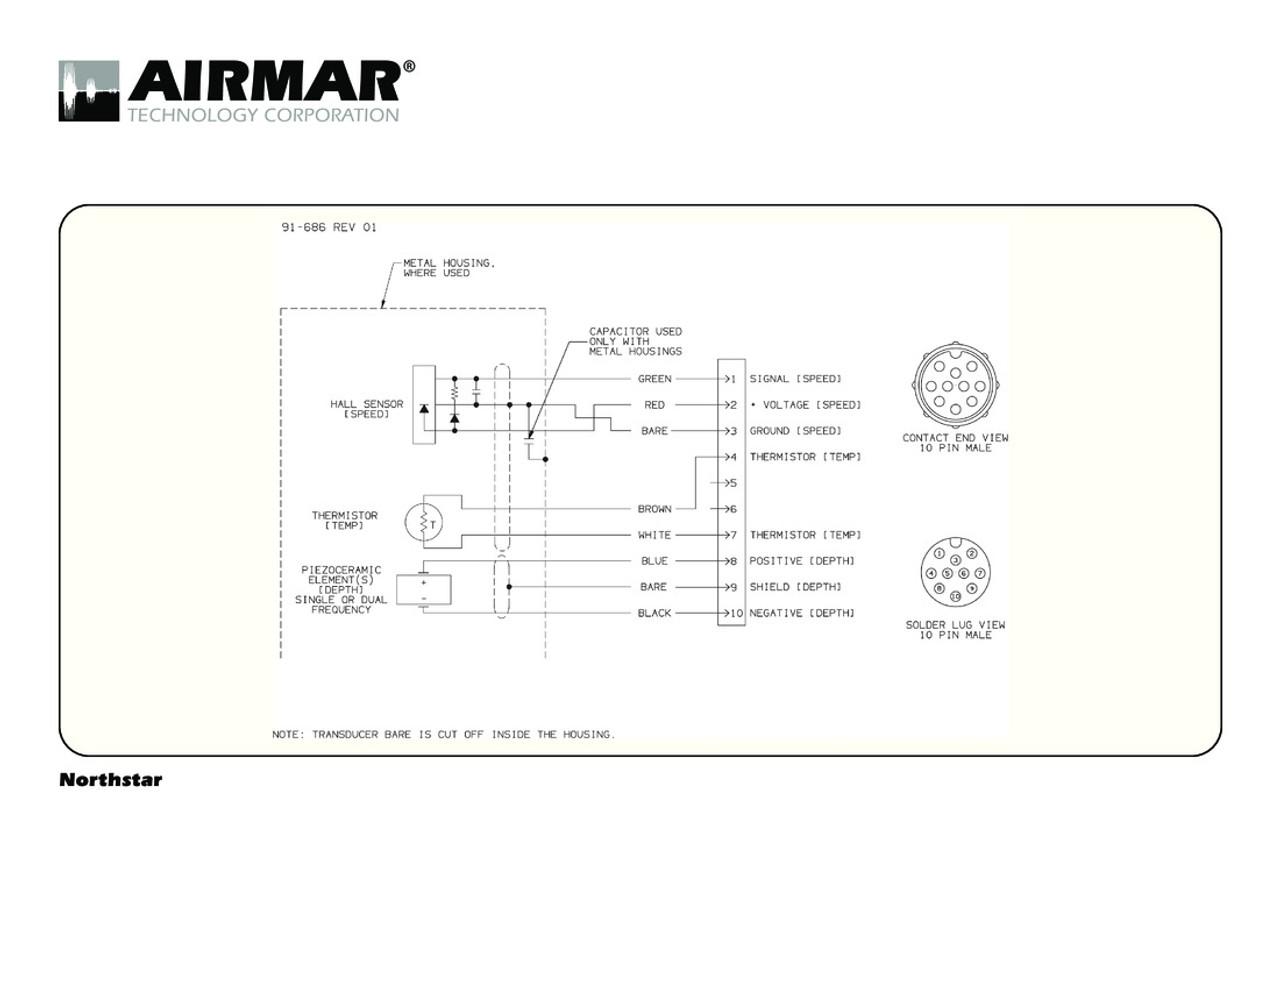 airmar wiring diagram northstar 600w 10 pin blue bottle marine rh bluebottlemarine com